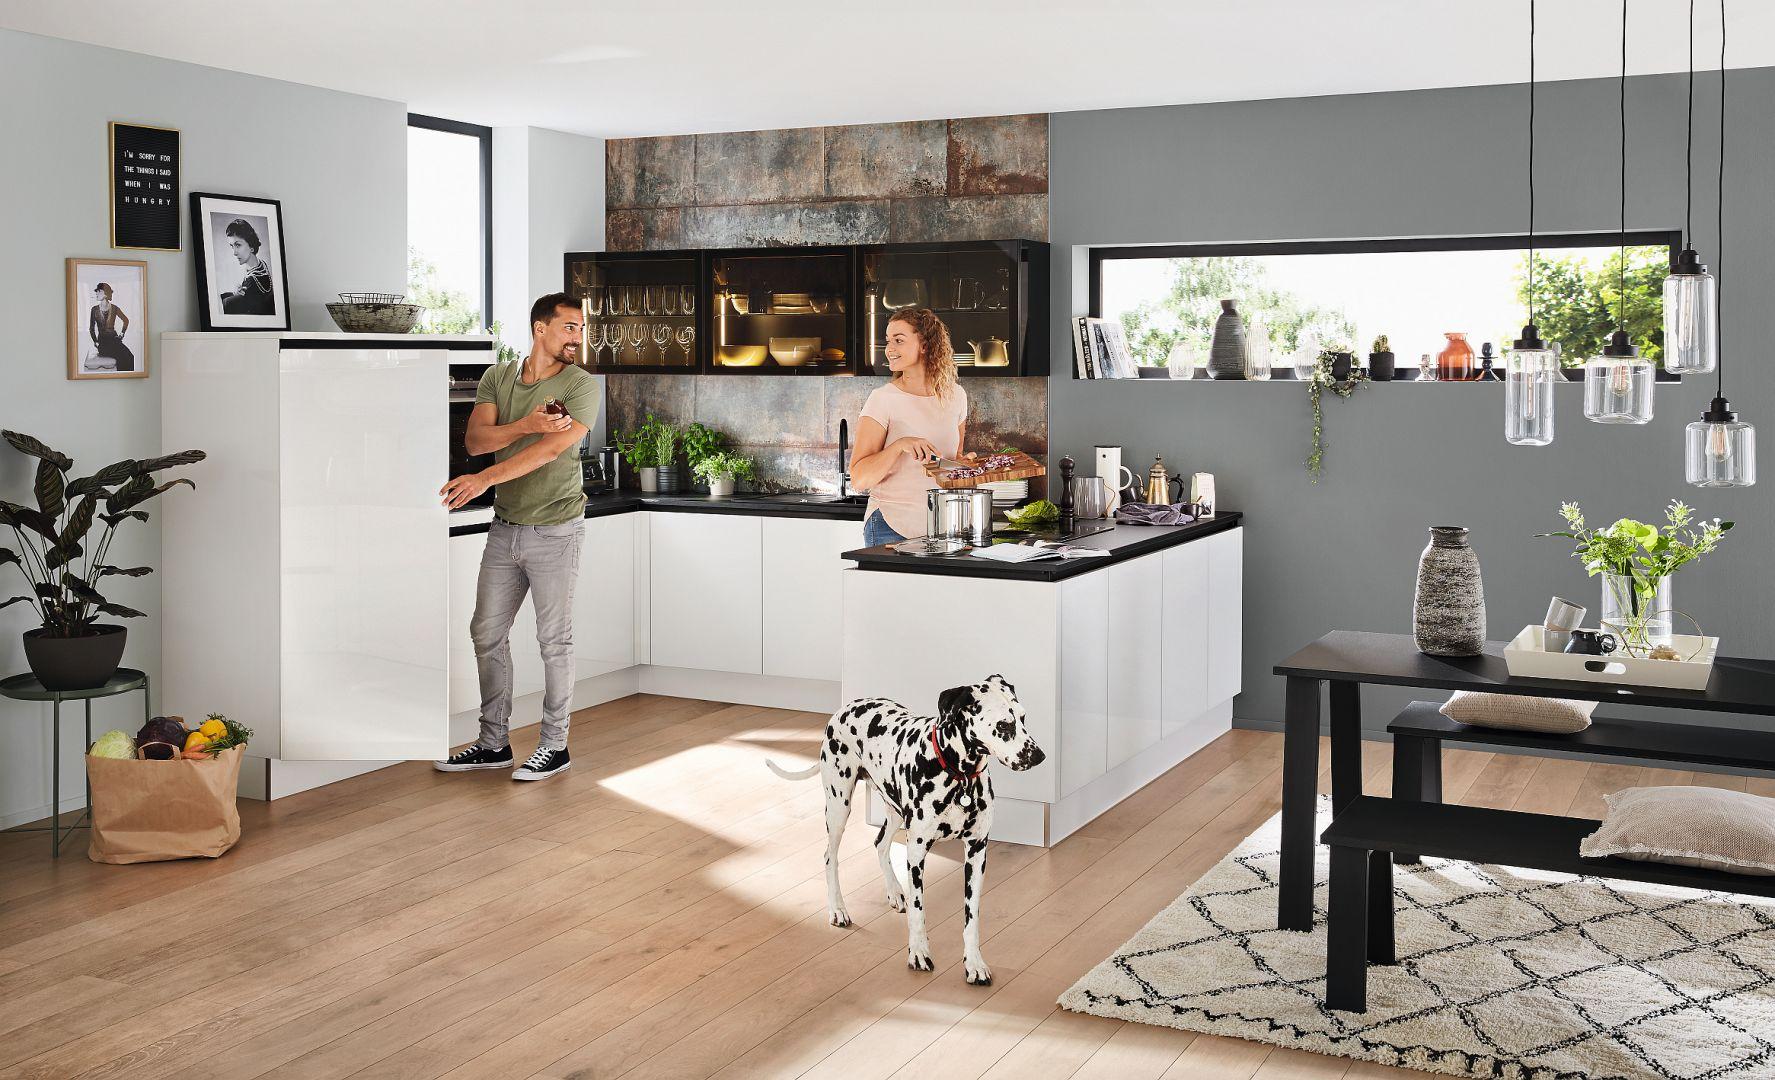 Kolekcja mebli kuchennych Glas Tec Plus dostępna w ofercie firmy Nolte Küchen. Fot. Nolte Küchen